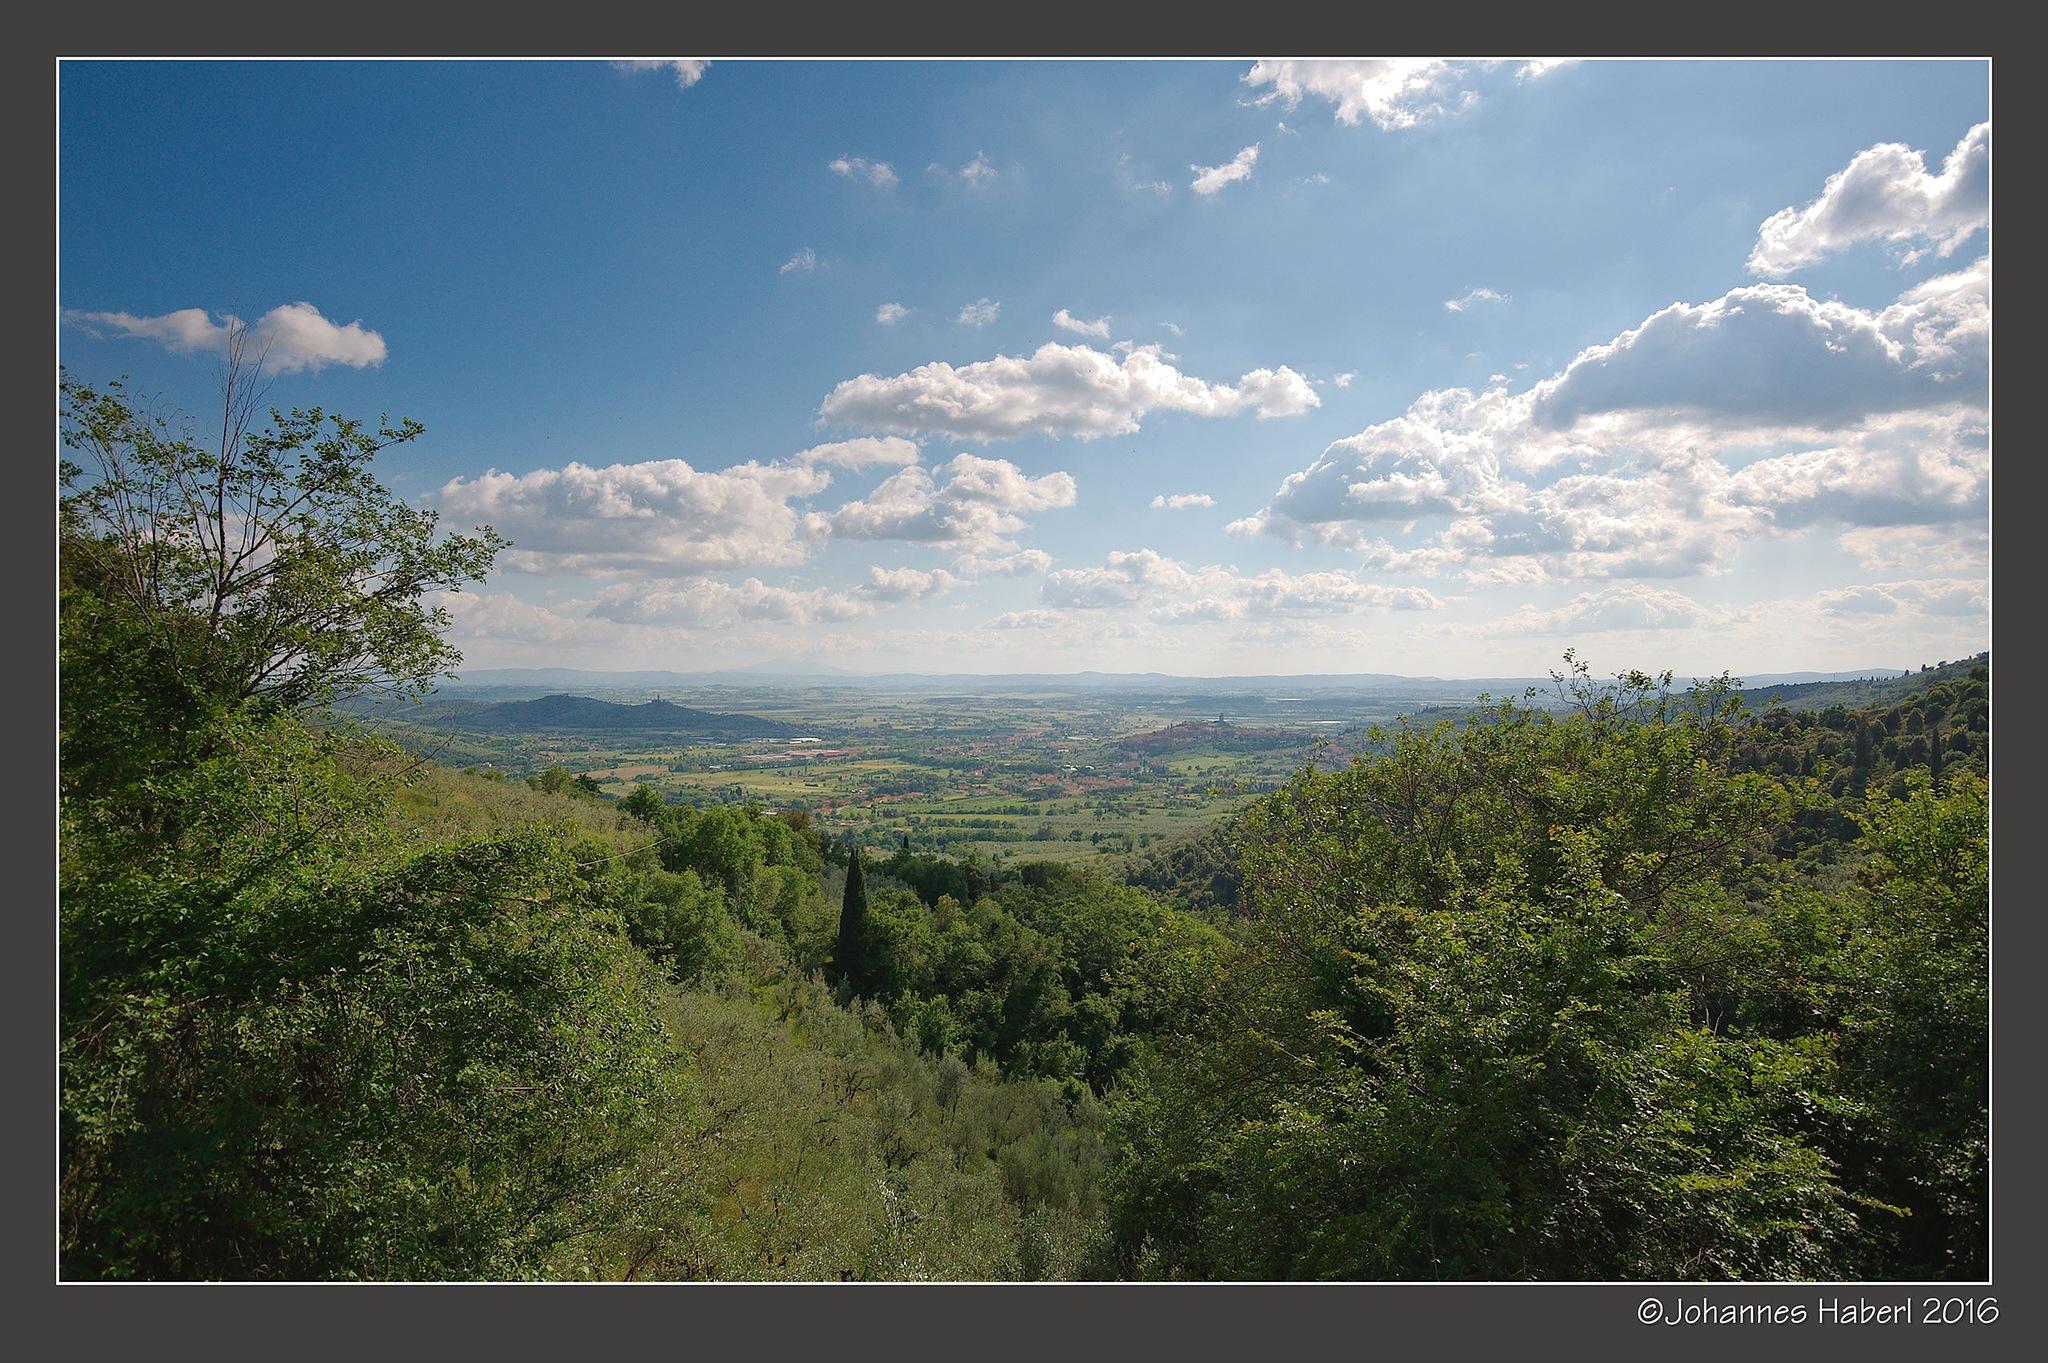 beautiful landscape by Johannes Haberl